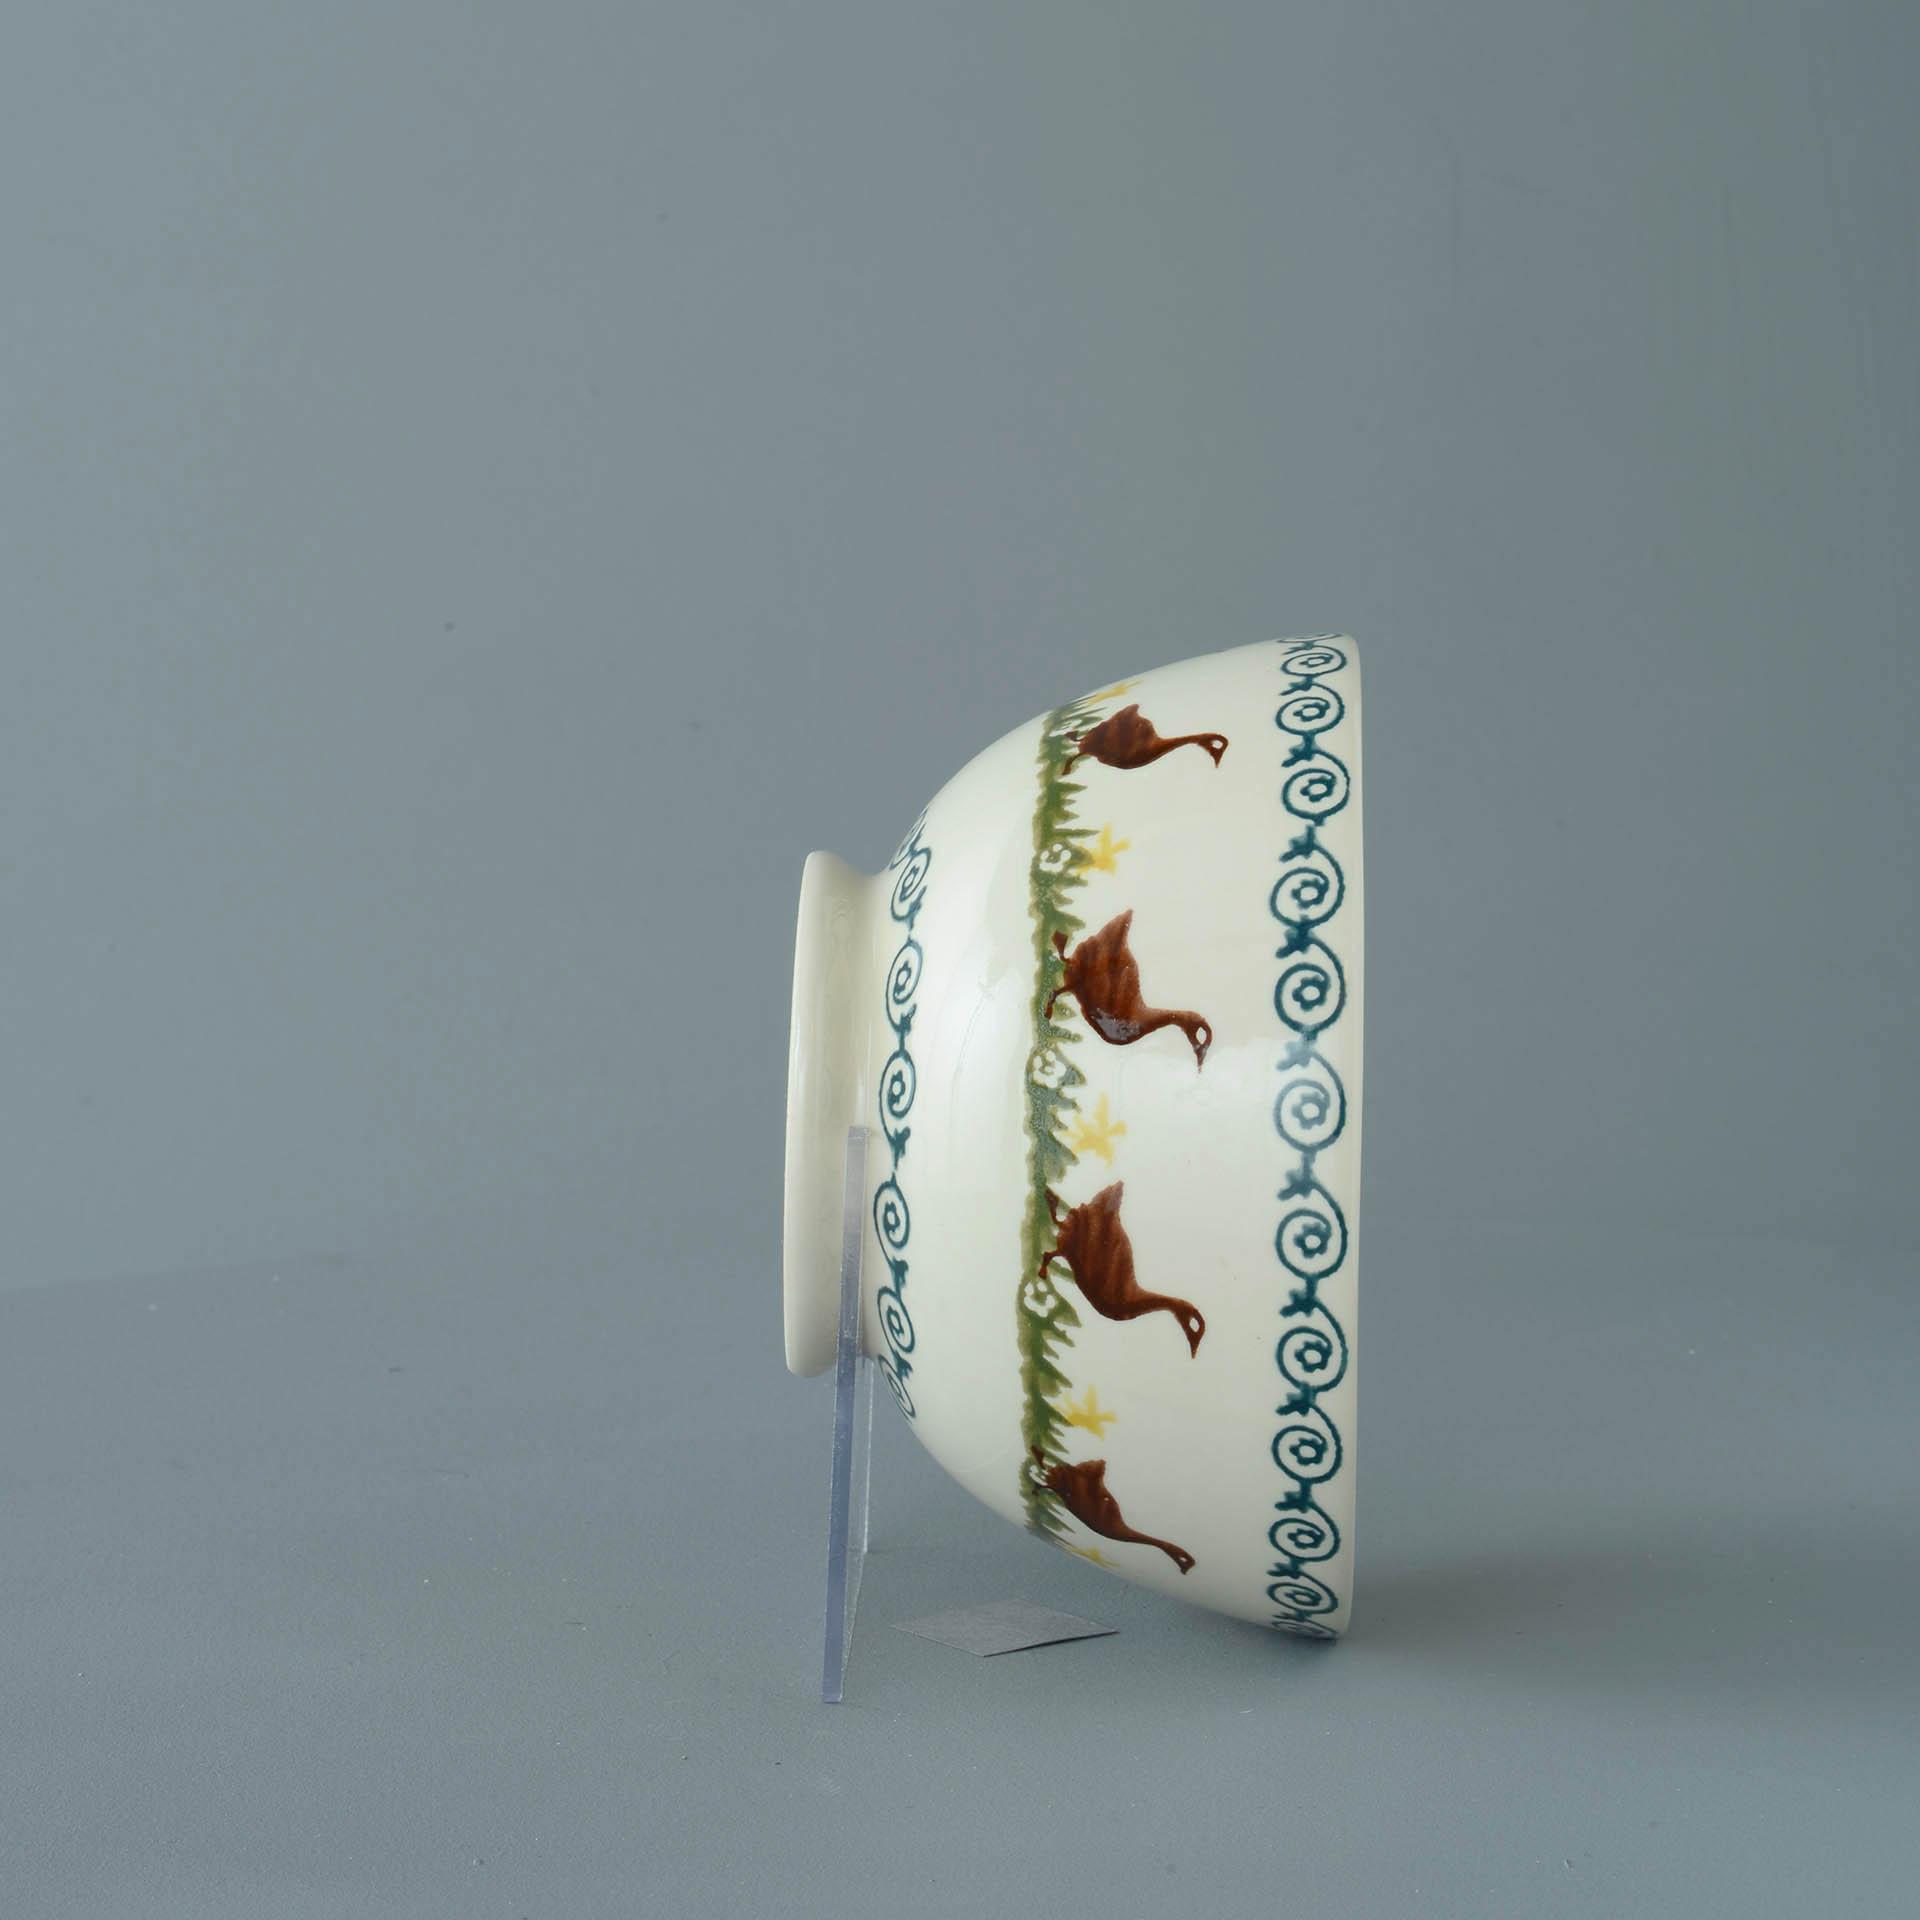 Ducks Soup Bowl 9 x 15.5cm